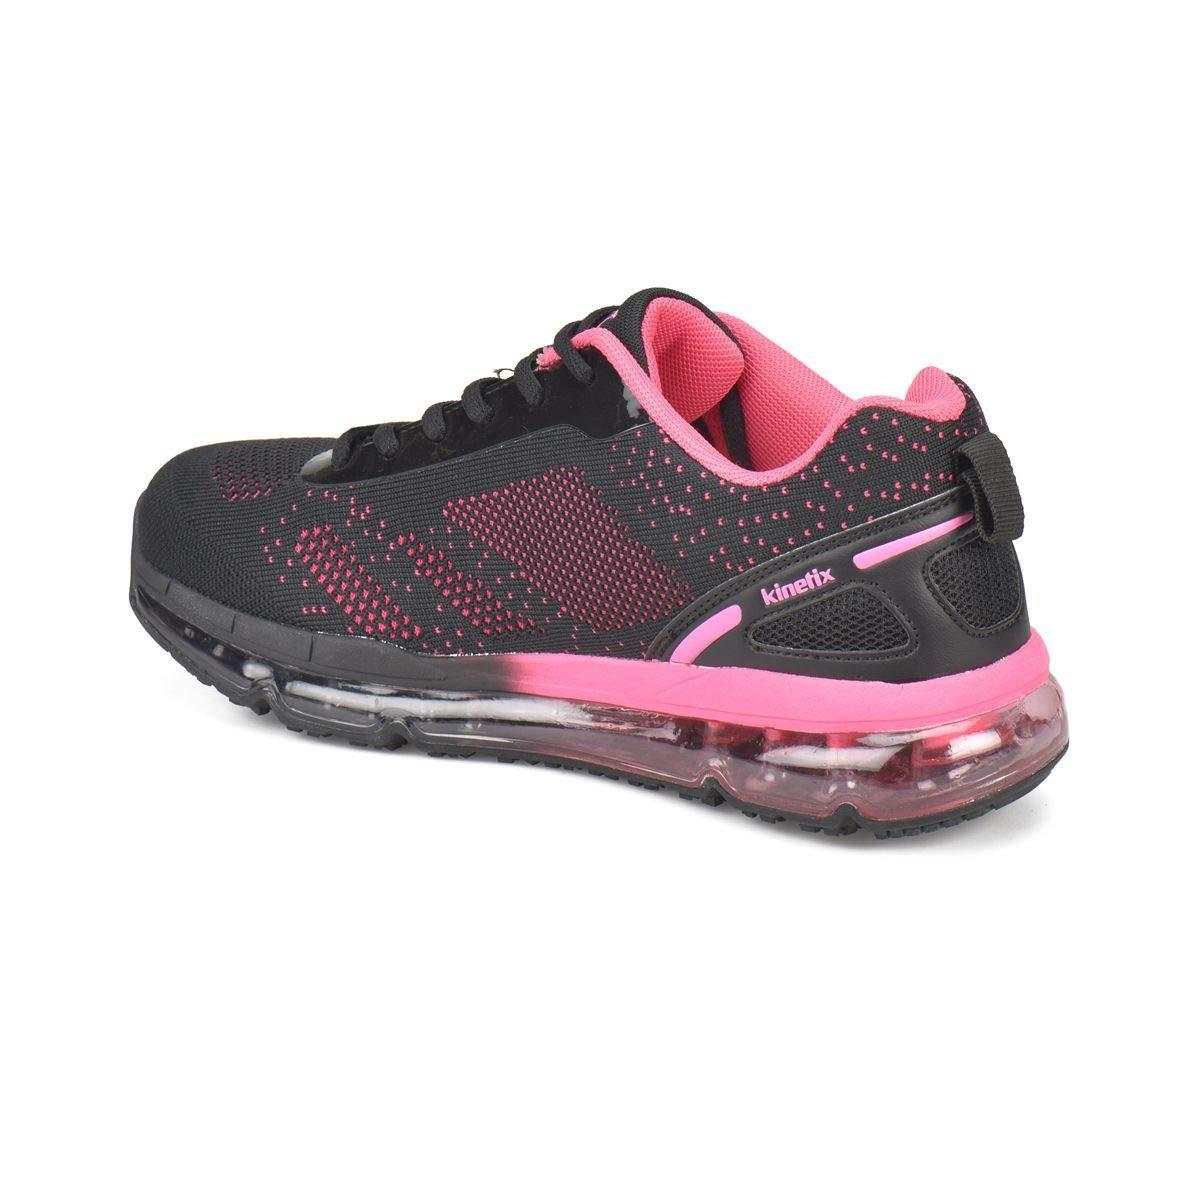 b9bda57a22dd2 Kinetix Argus Siyah Pembe Kadın Spor Ayakkabı: Amazon.com.tr